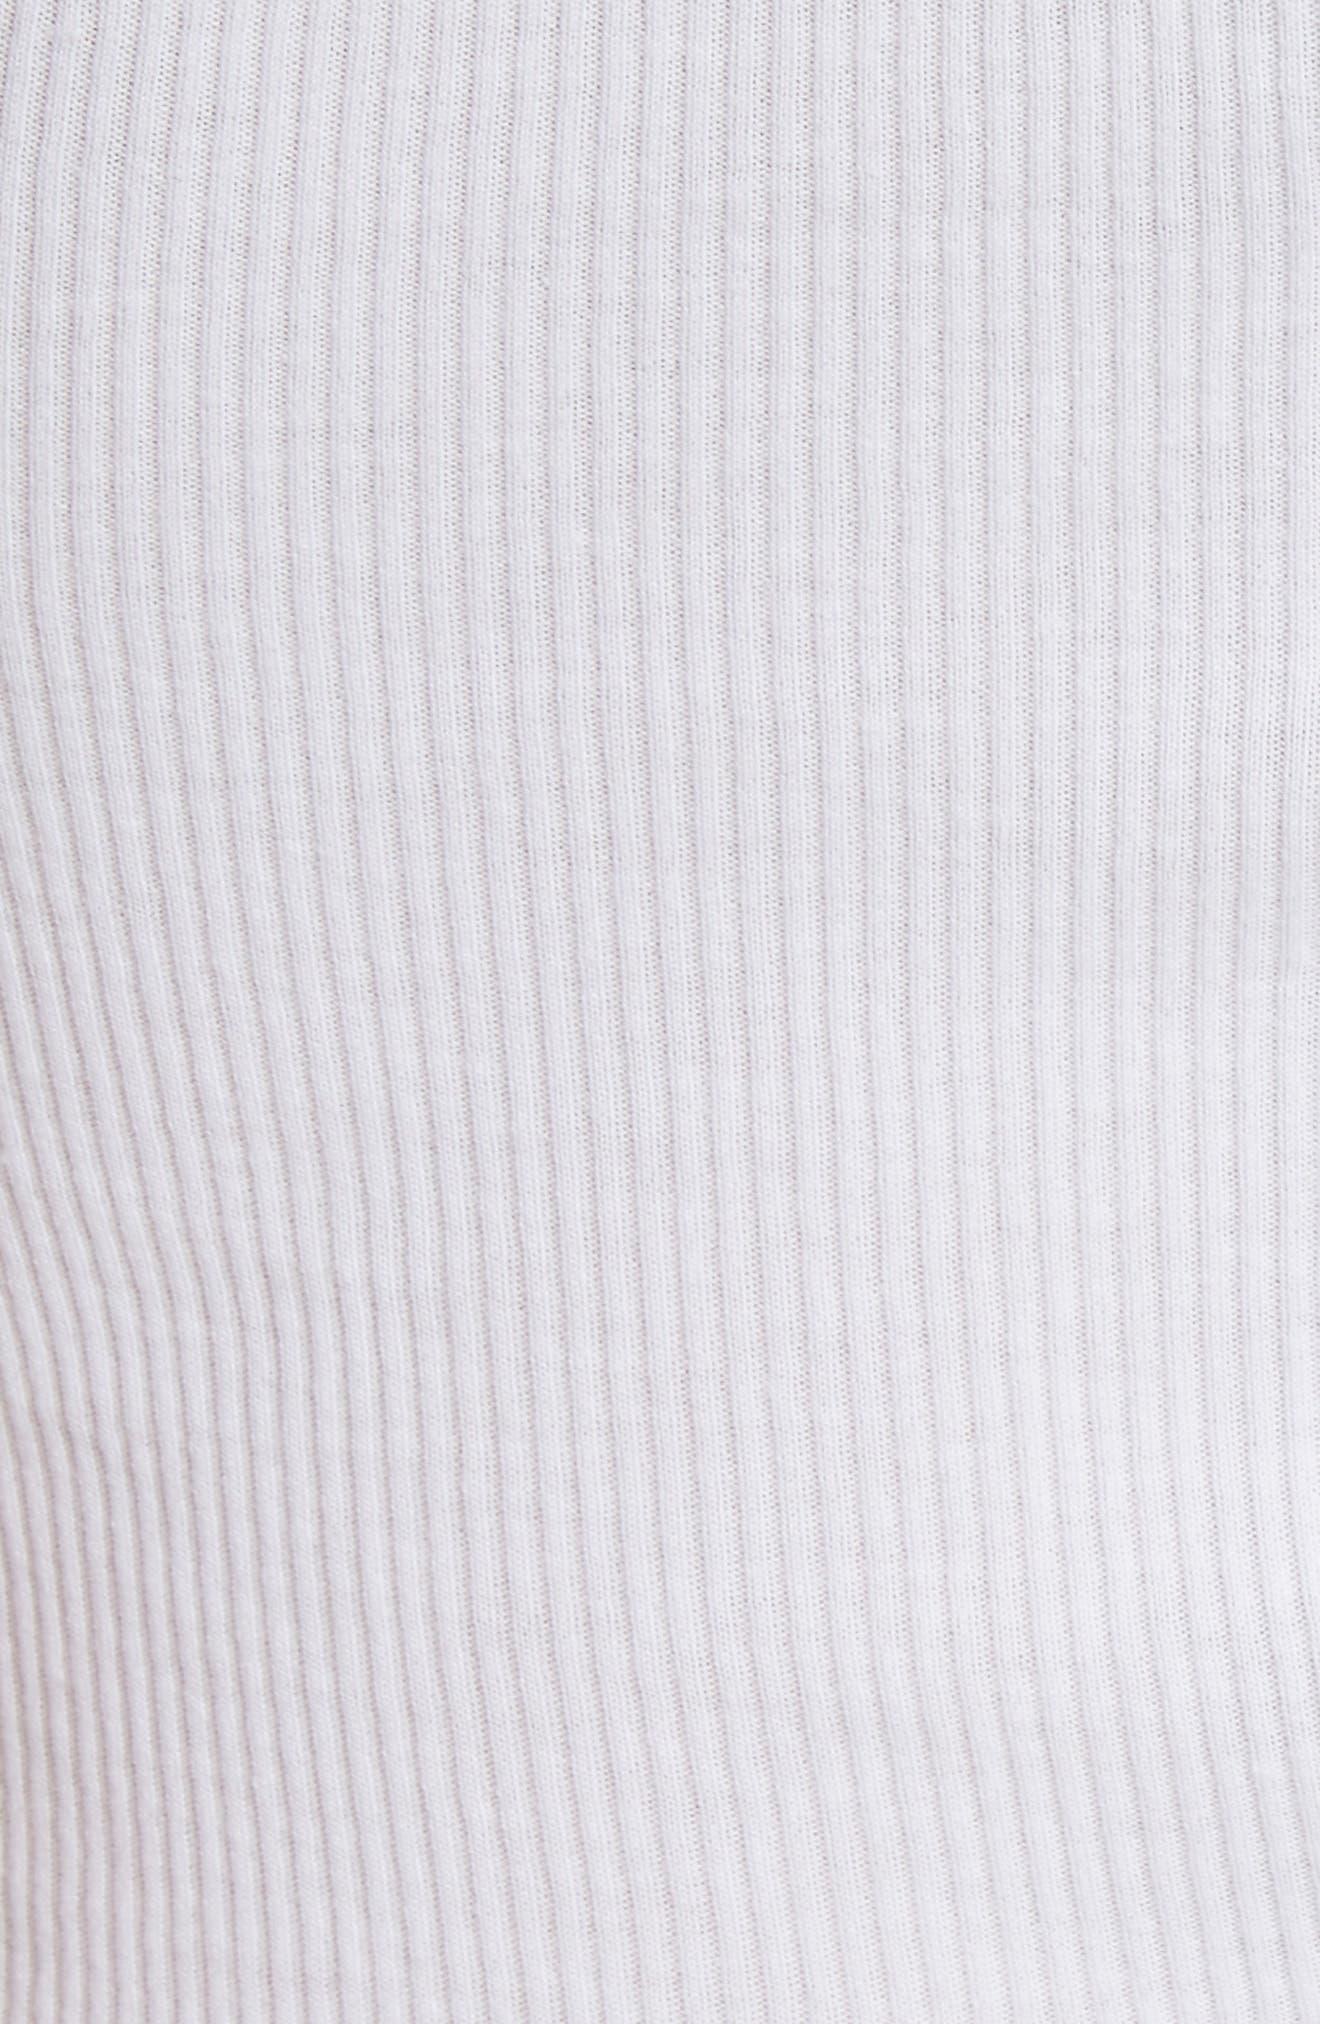 Ribbed Tank Top,                             Alternate thumbnail 5, color,                             Optic White